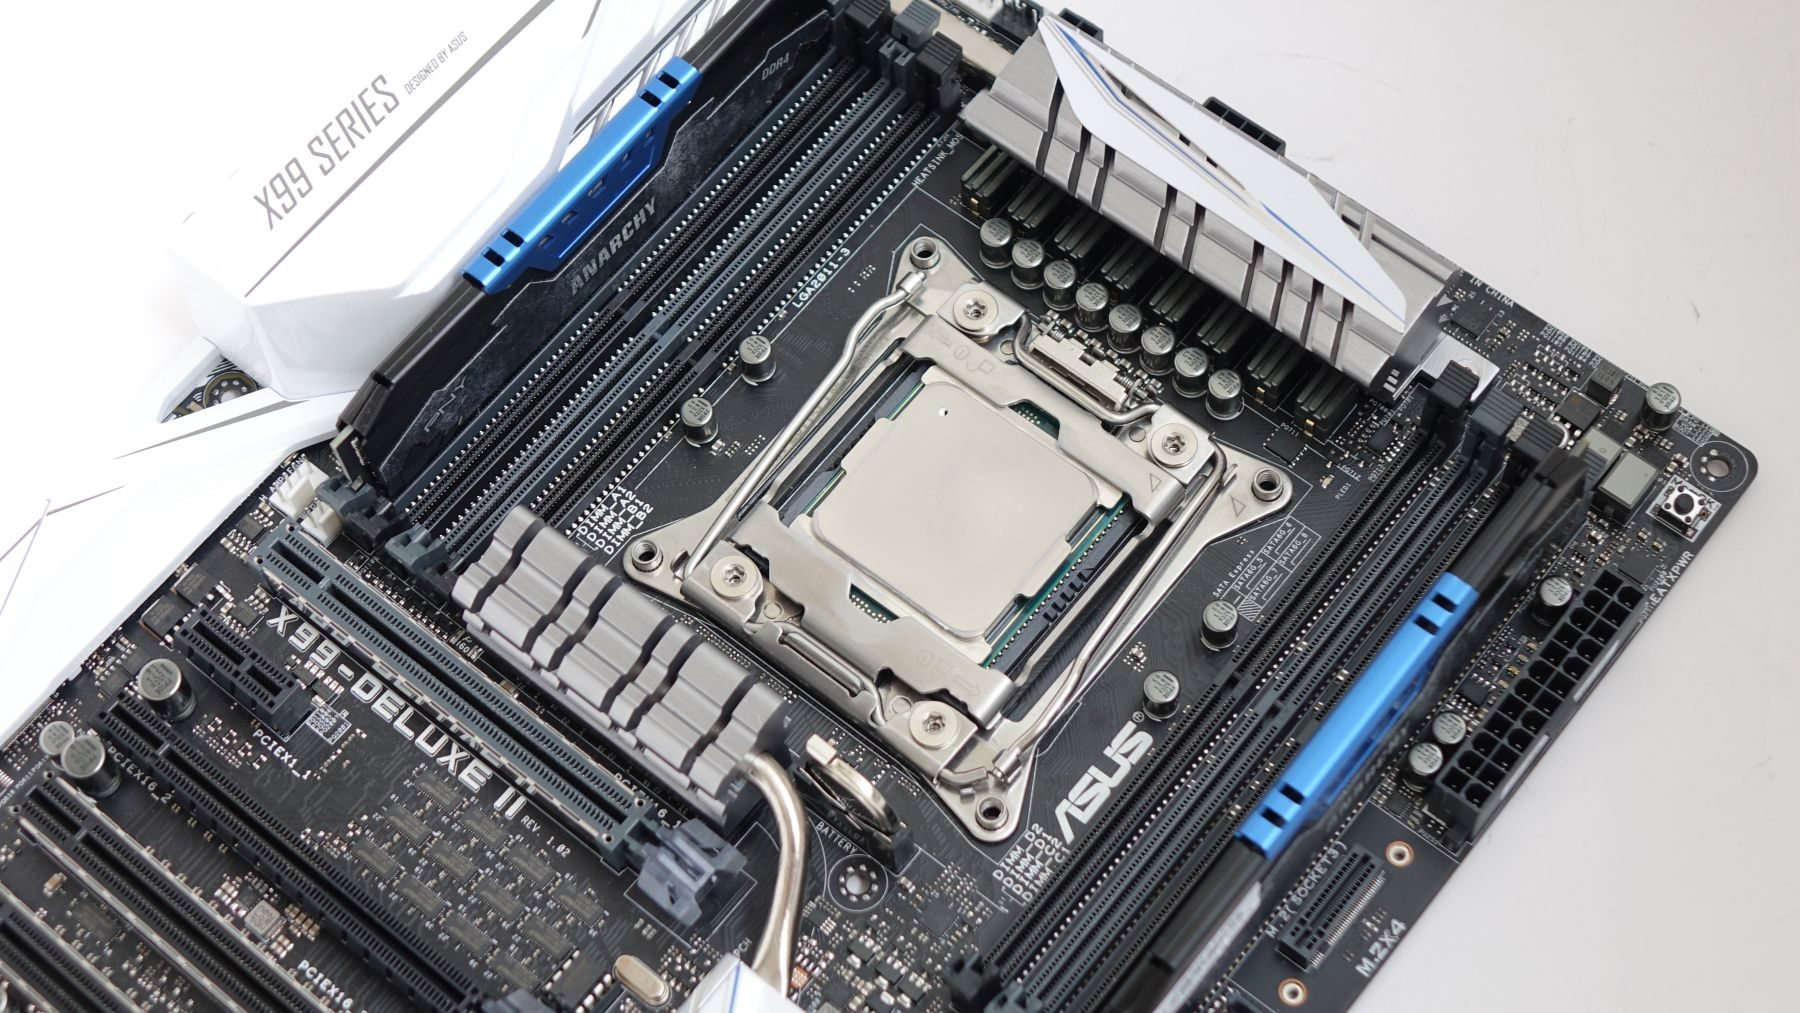 Intel Xeon E5-2609 v4 on asus x99